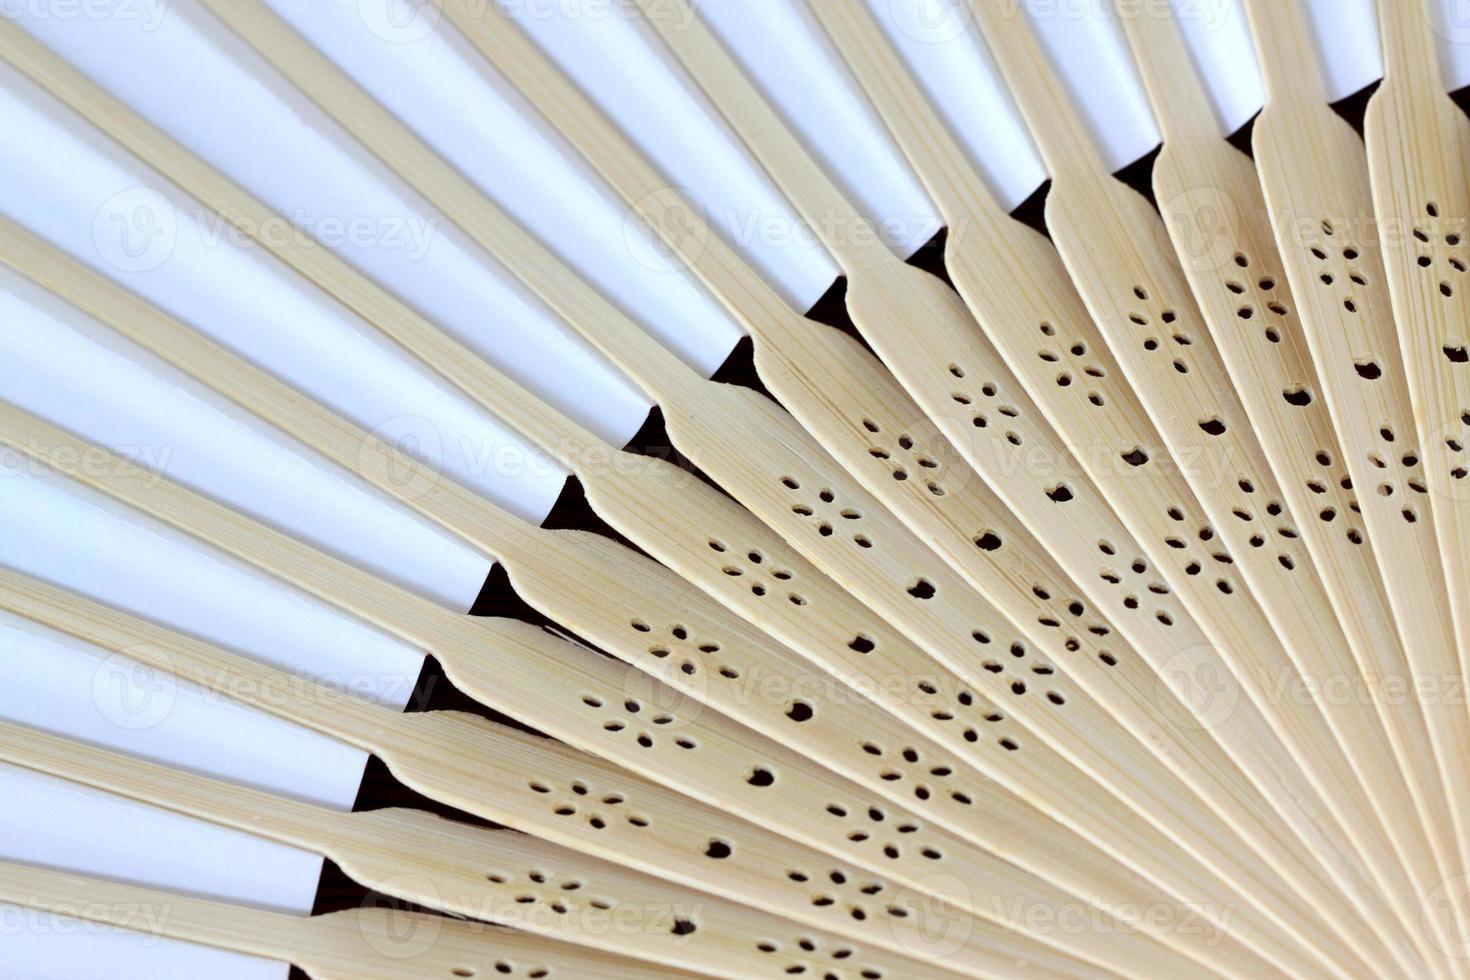 patroon van Japanse opvouwbare ventilator. foto